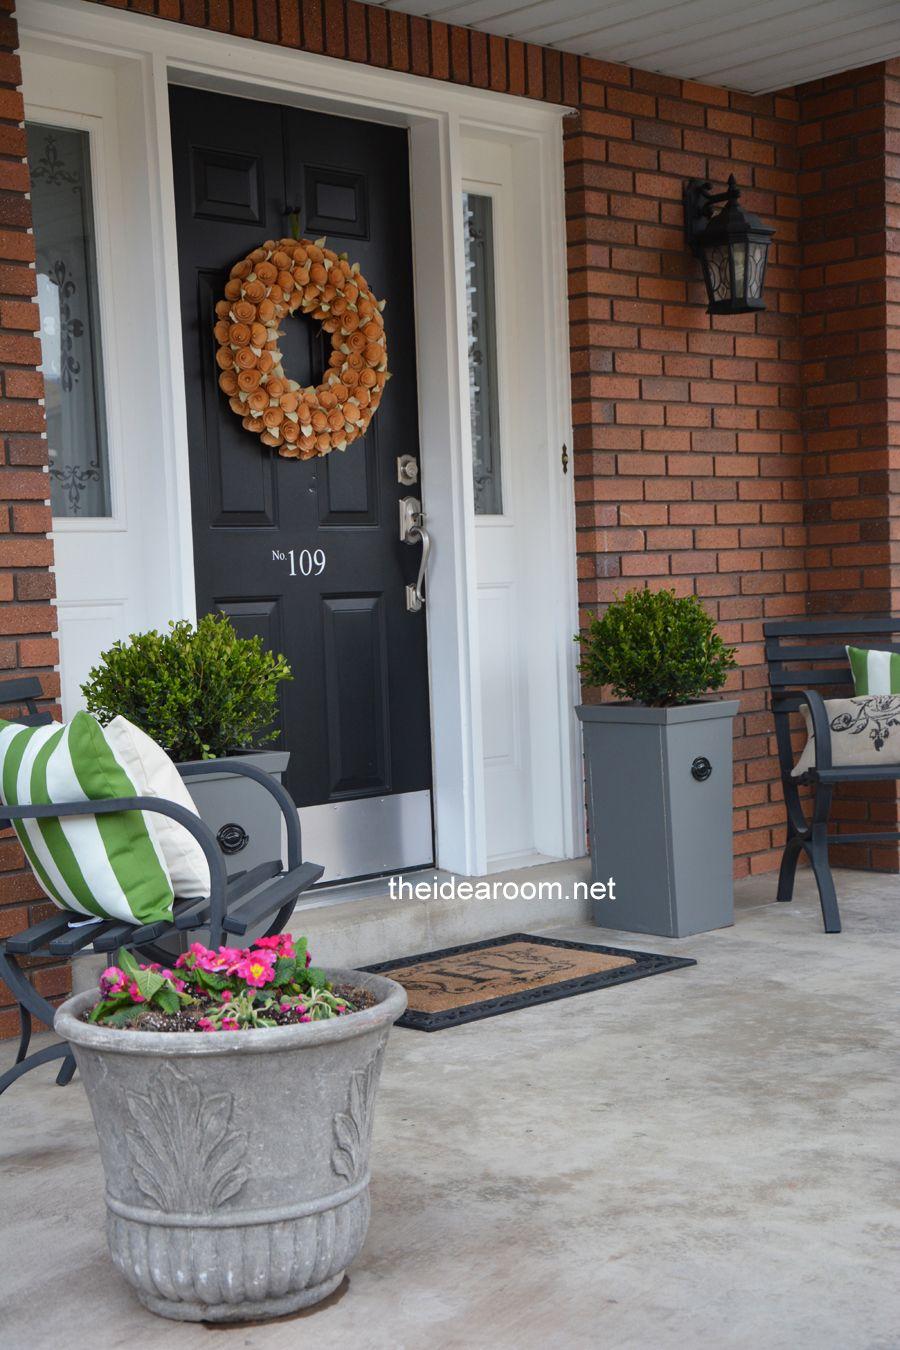 diy porch planter best of the blogosphere pinterest porch diy porch and front porch. Black Bedroom Furniture Sets. Home Design Ideas